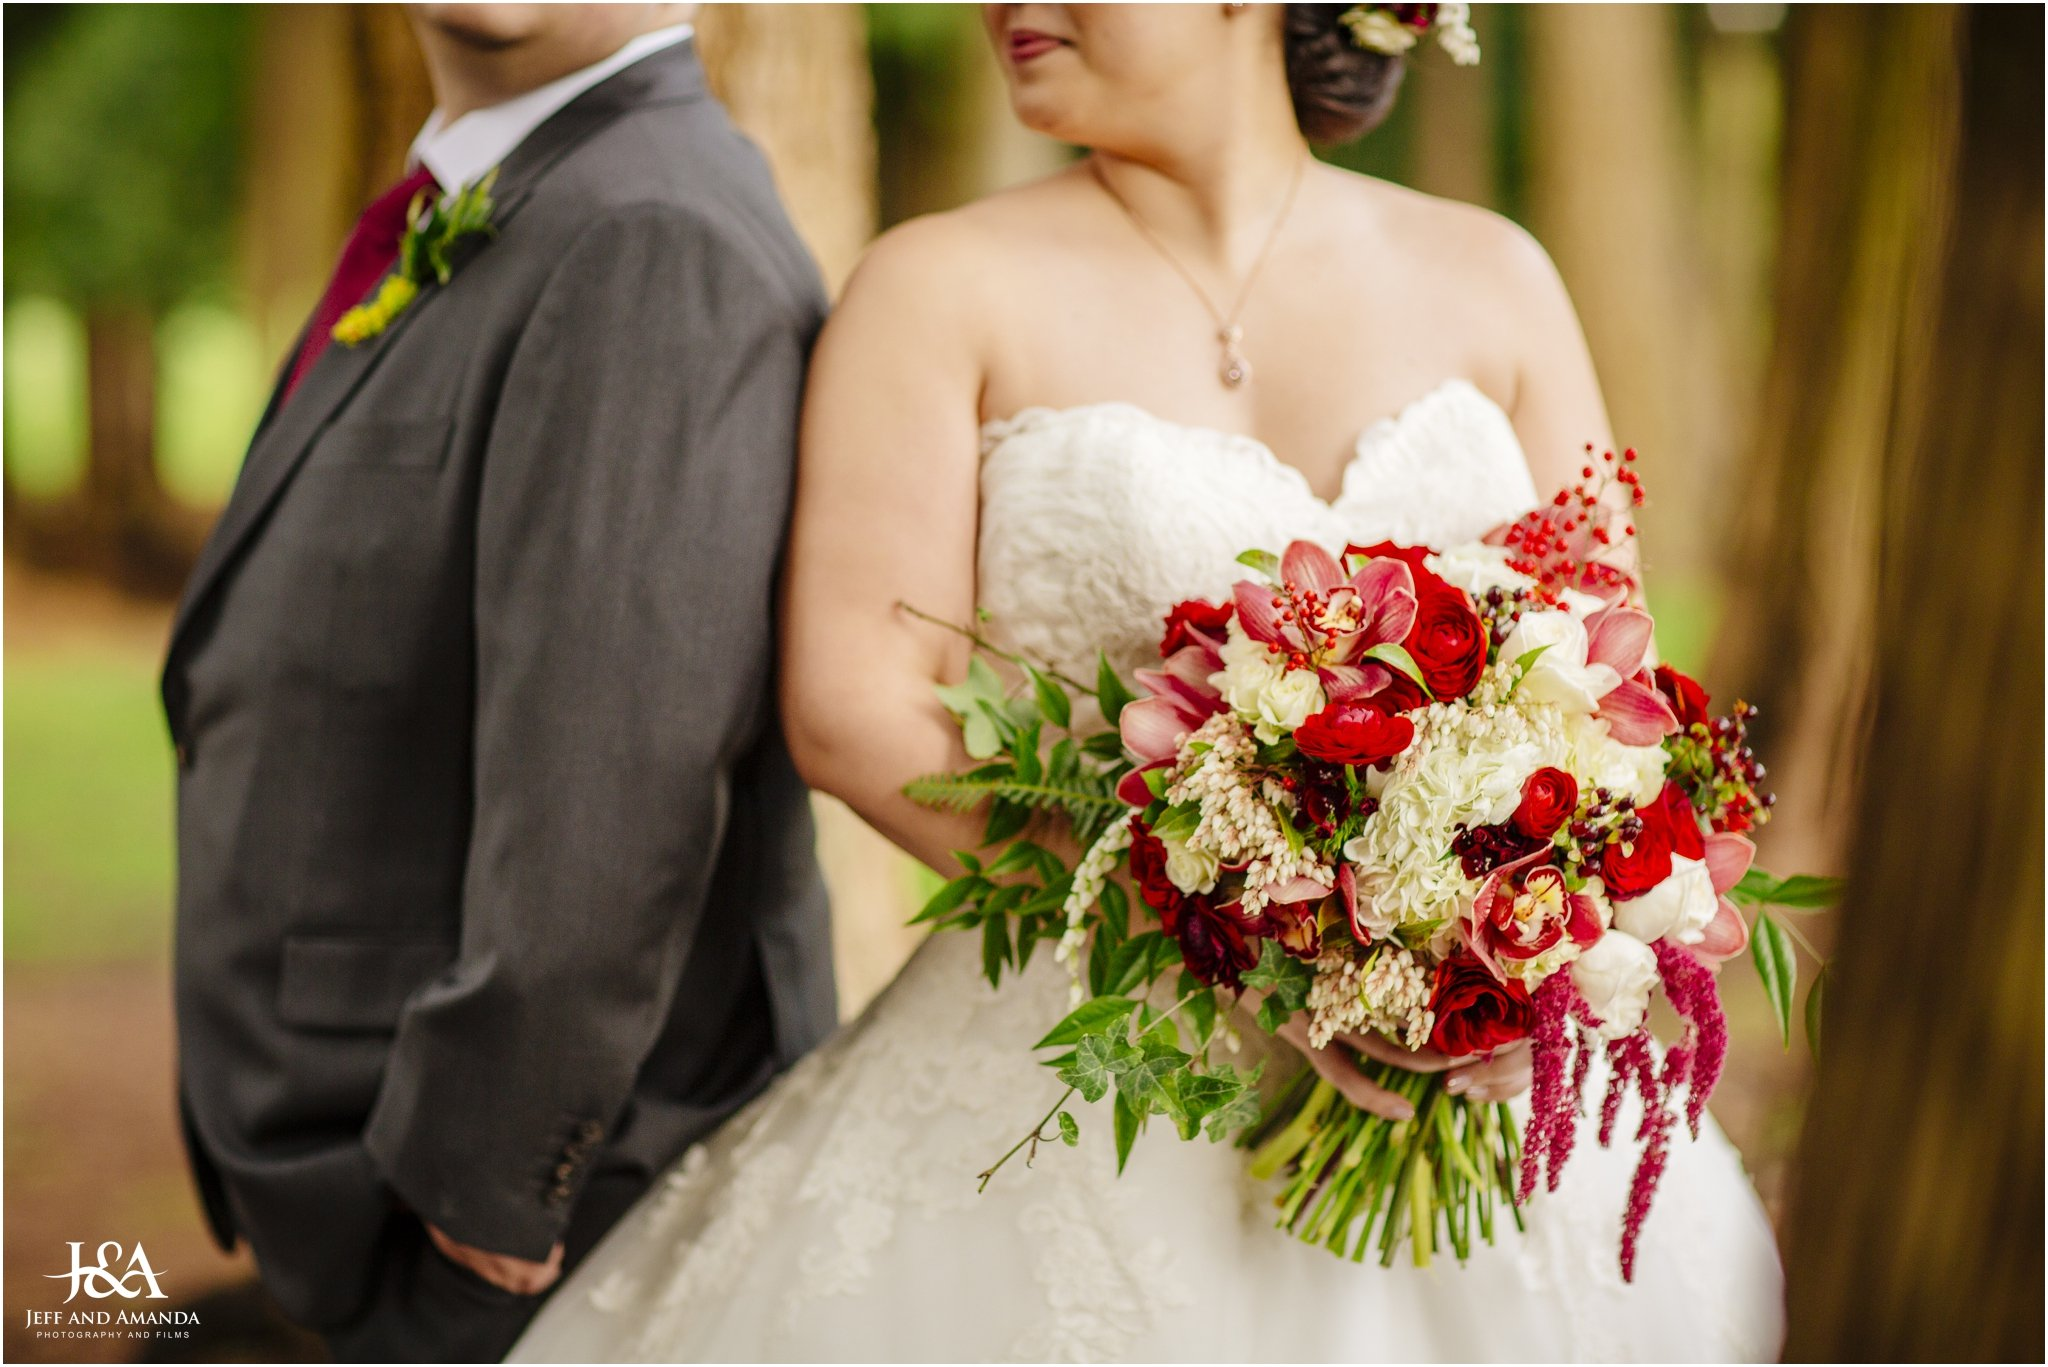 Dave and Kari s Wedding-Facebook Ready-0138.jpg